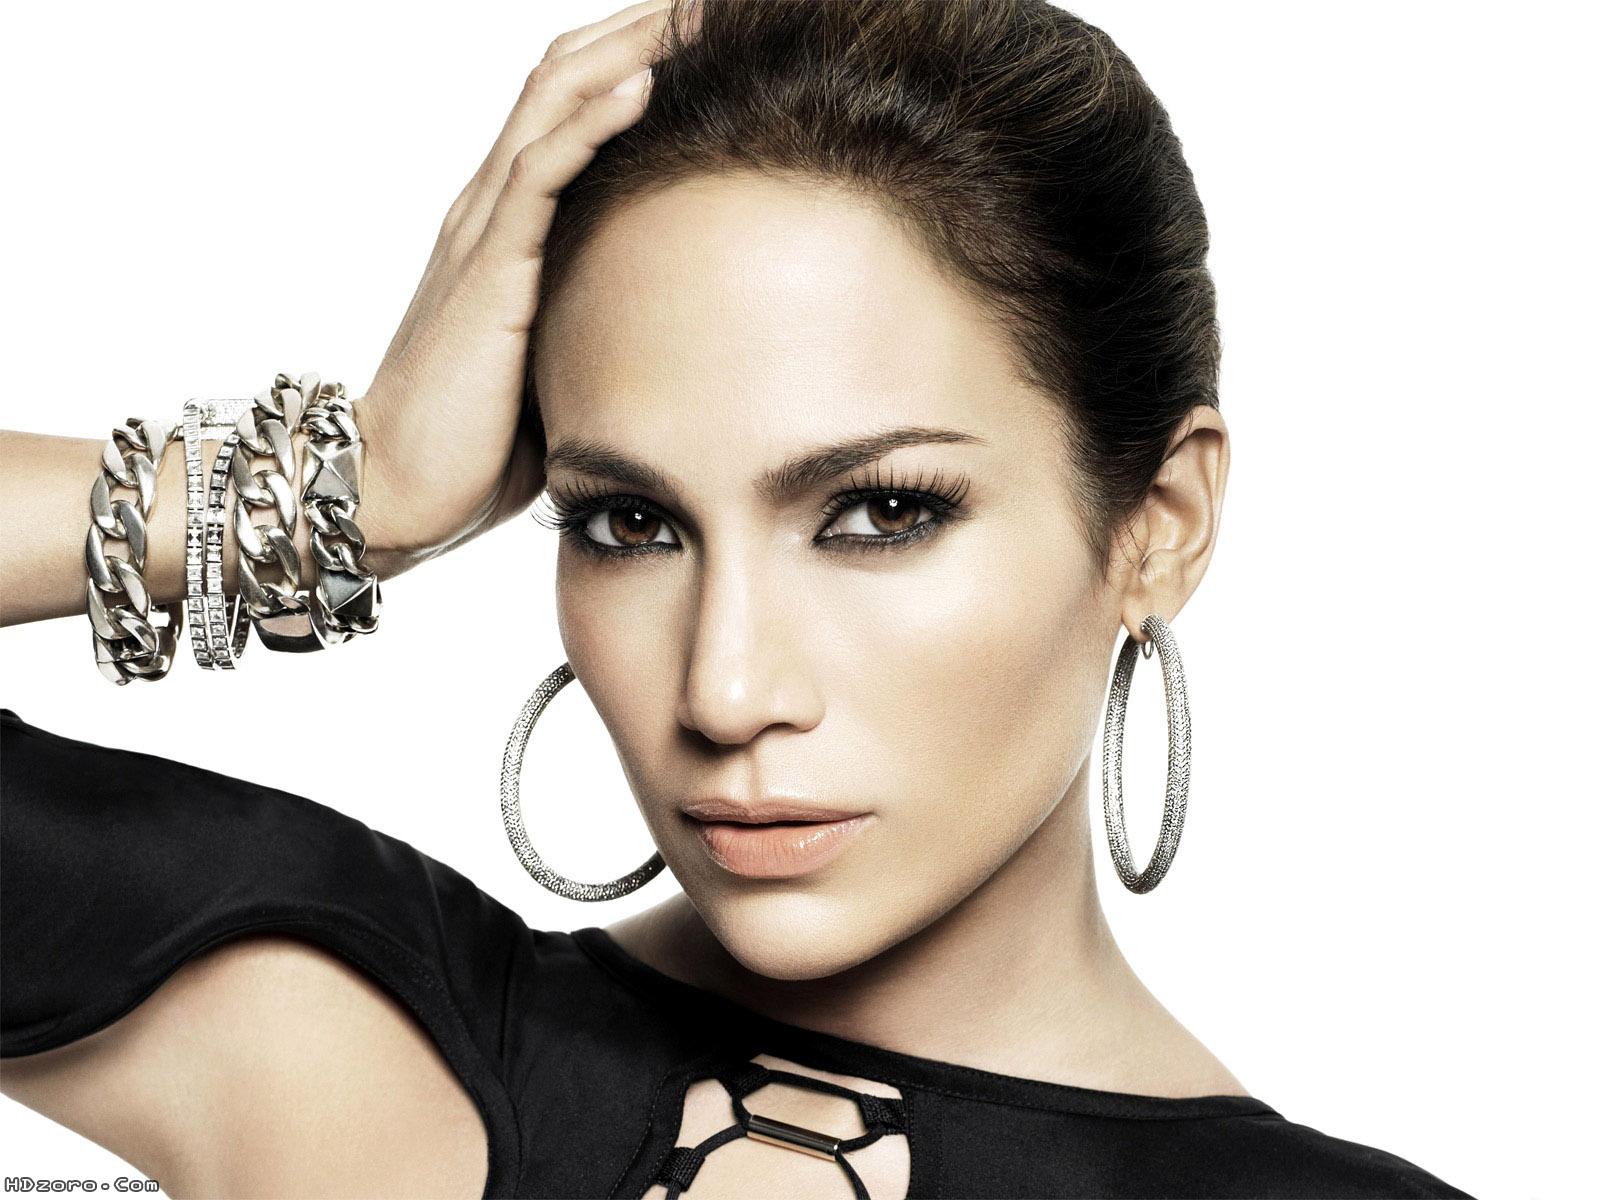 http://1.bp.blogspot.com/-WvaDEQRoKRs/UUldKTFzi8I/AAAAAAAARIw/LU2m7o6JD90/s1600/Jennifer+Lopez+10.jpg